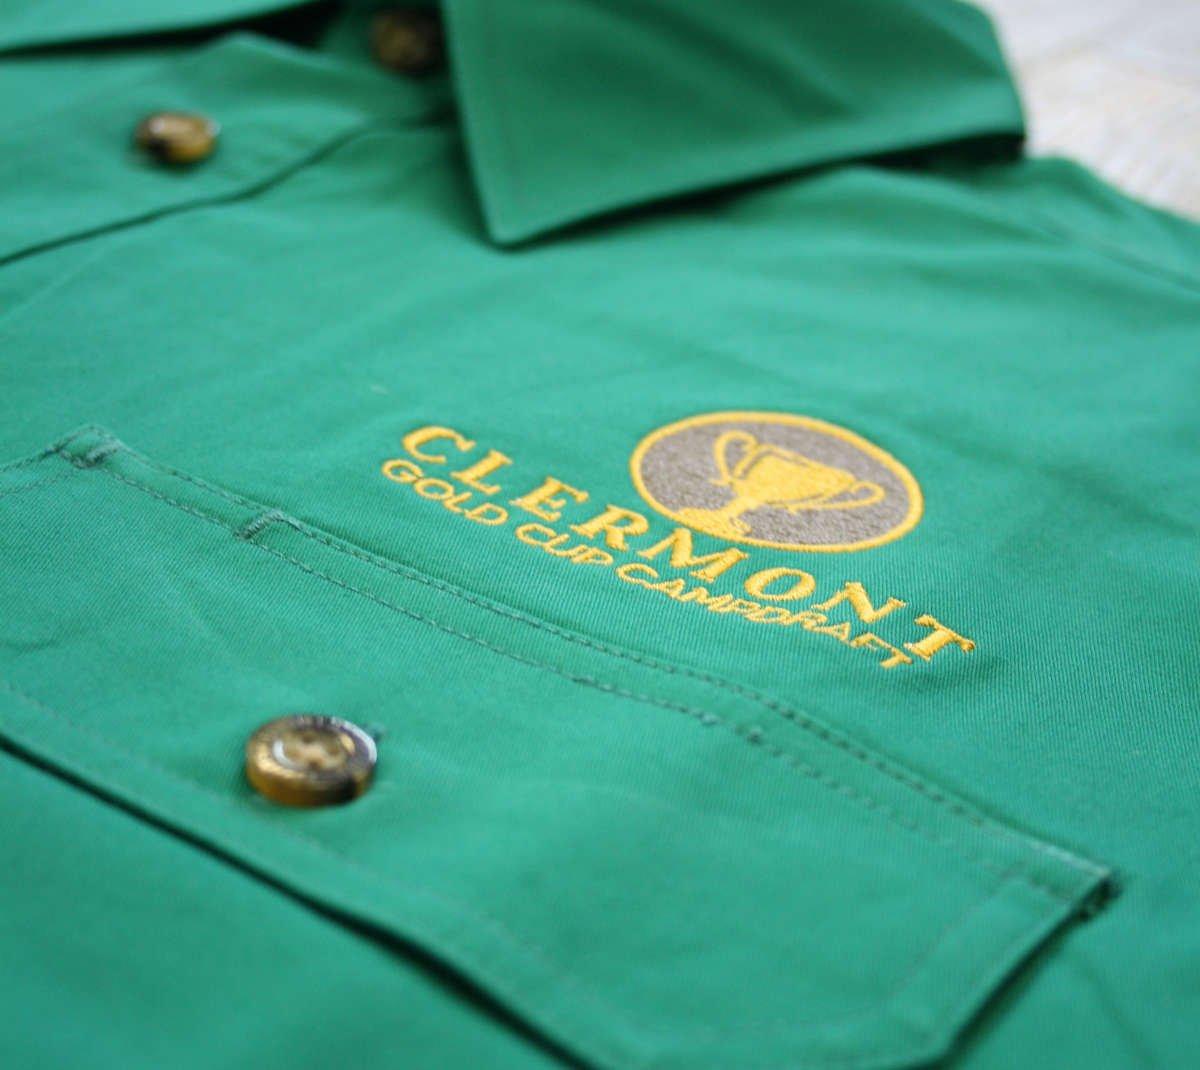 Custom Embroidery – Just Country Australia Pty Ltd